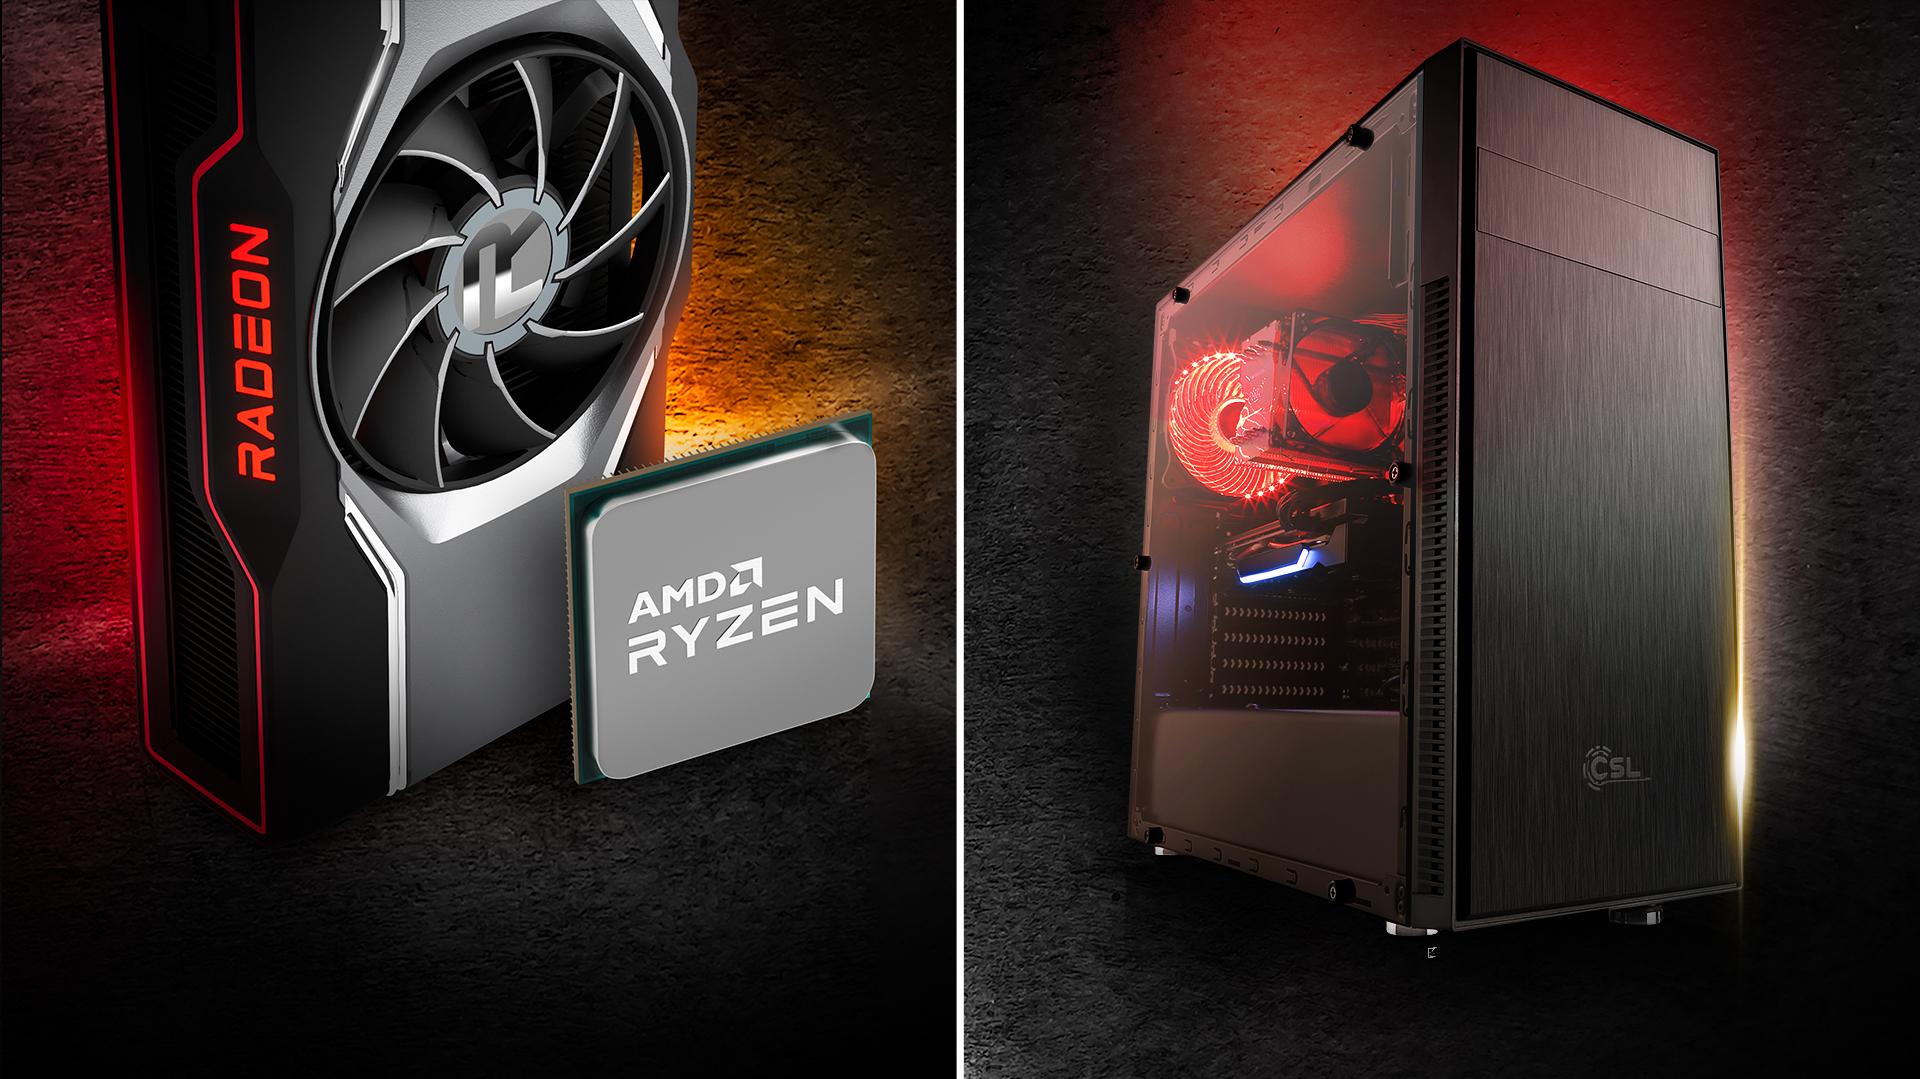 AMD Ryzen™ and Radeon™